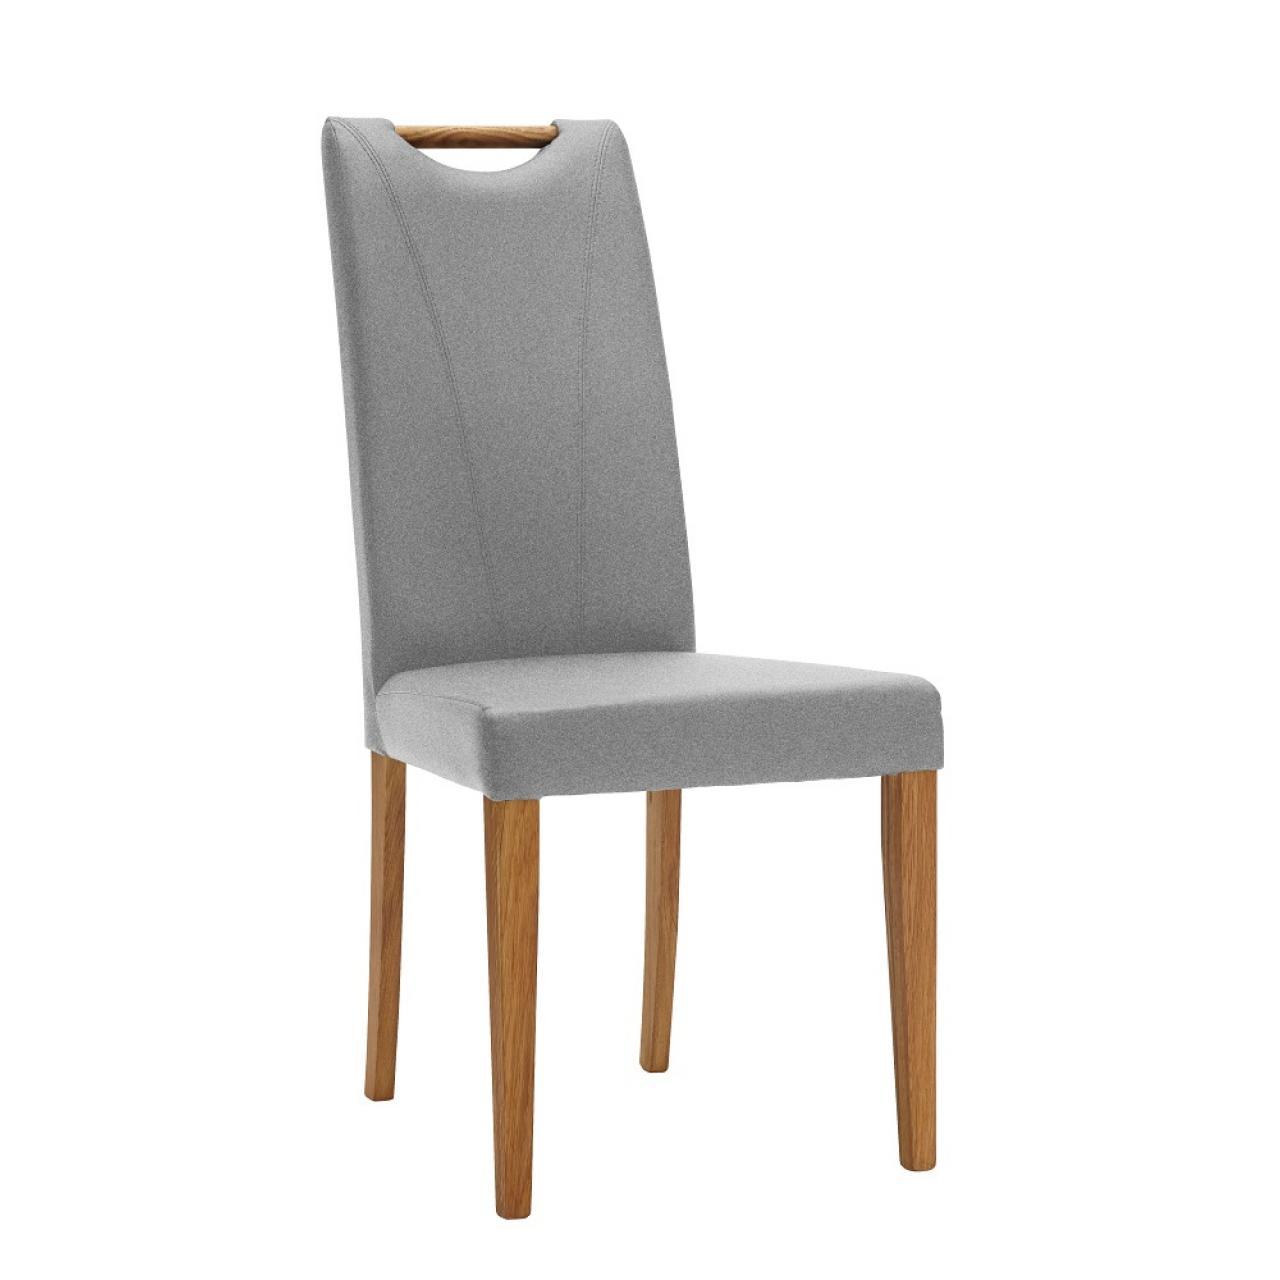 Stuhl 44 E6 Light Grey Stoff Massivholz Natur Esszimmerstuhl Küche